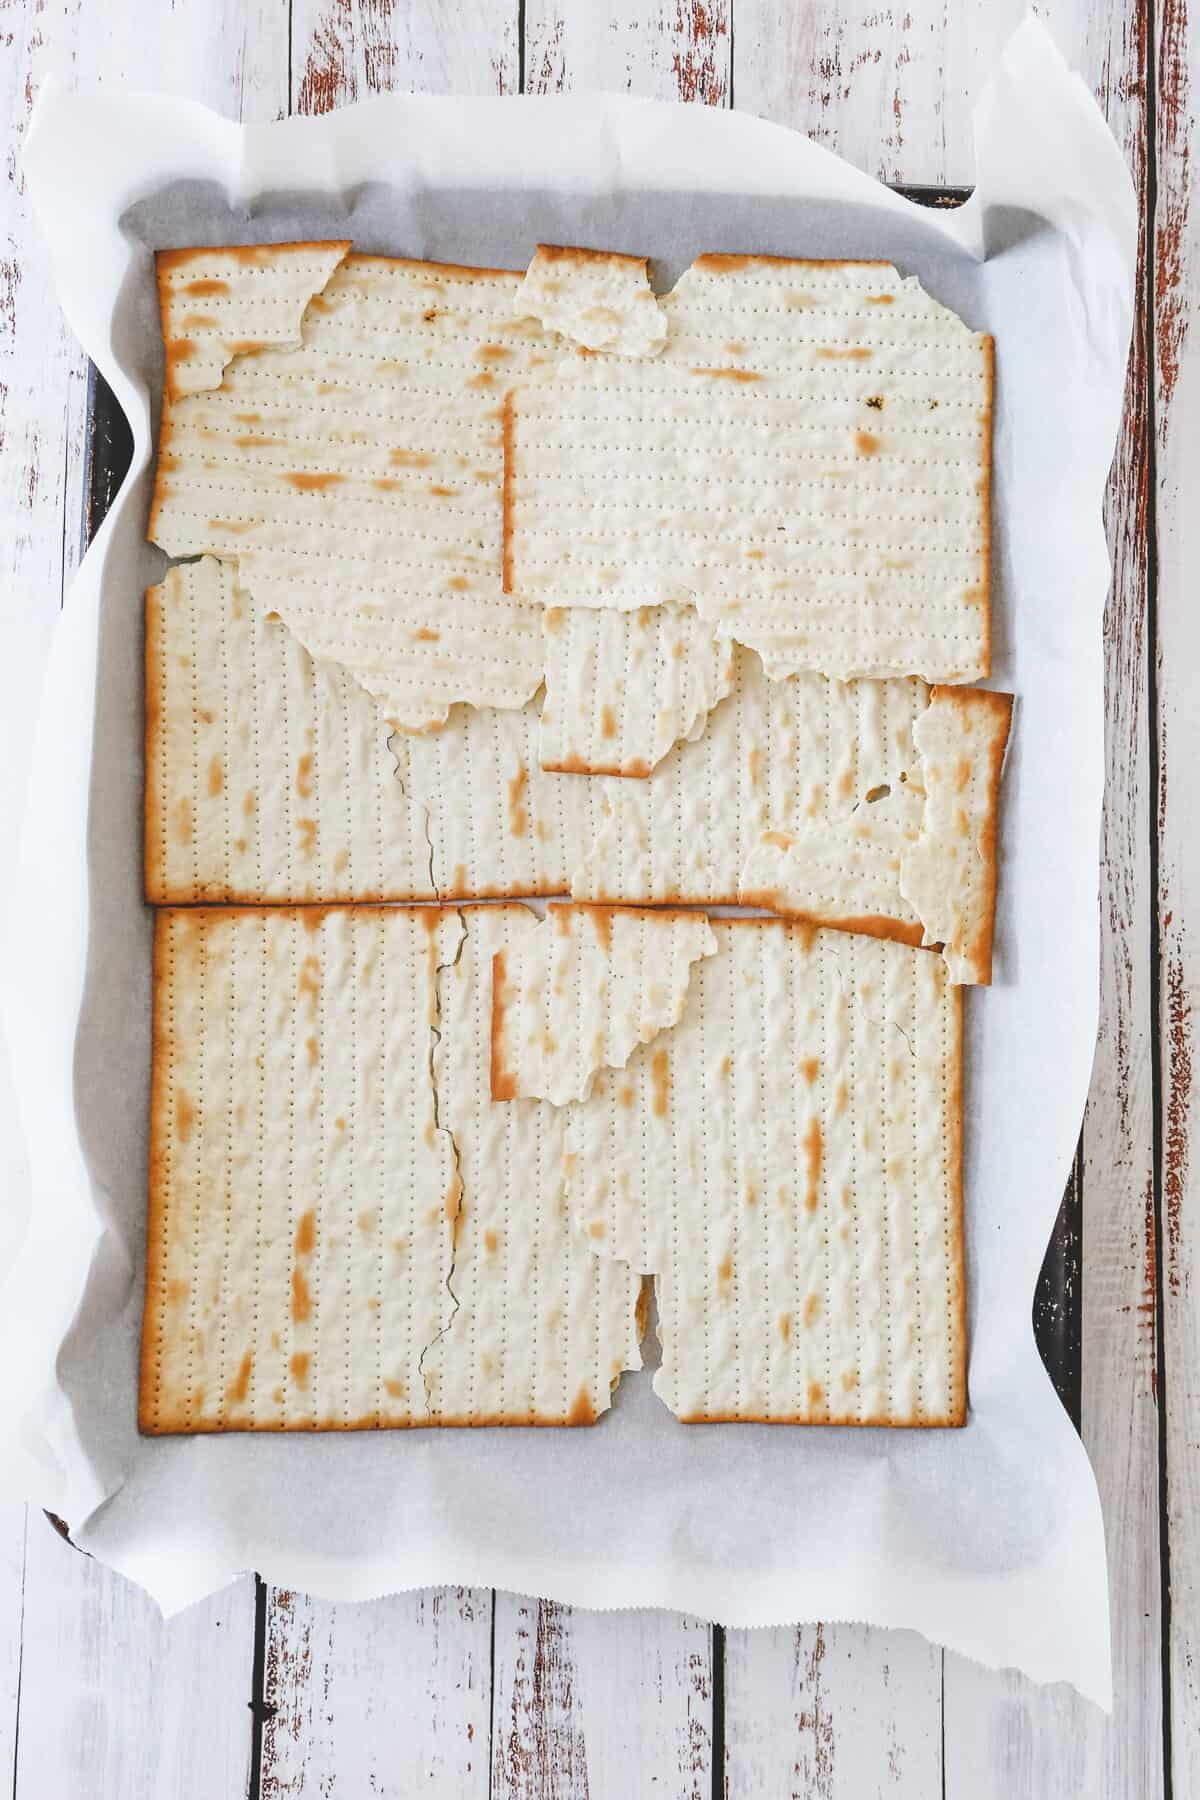 matzos on baking sheet